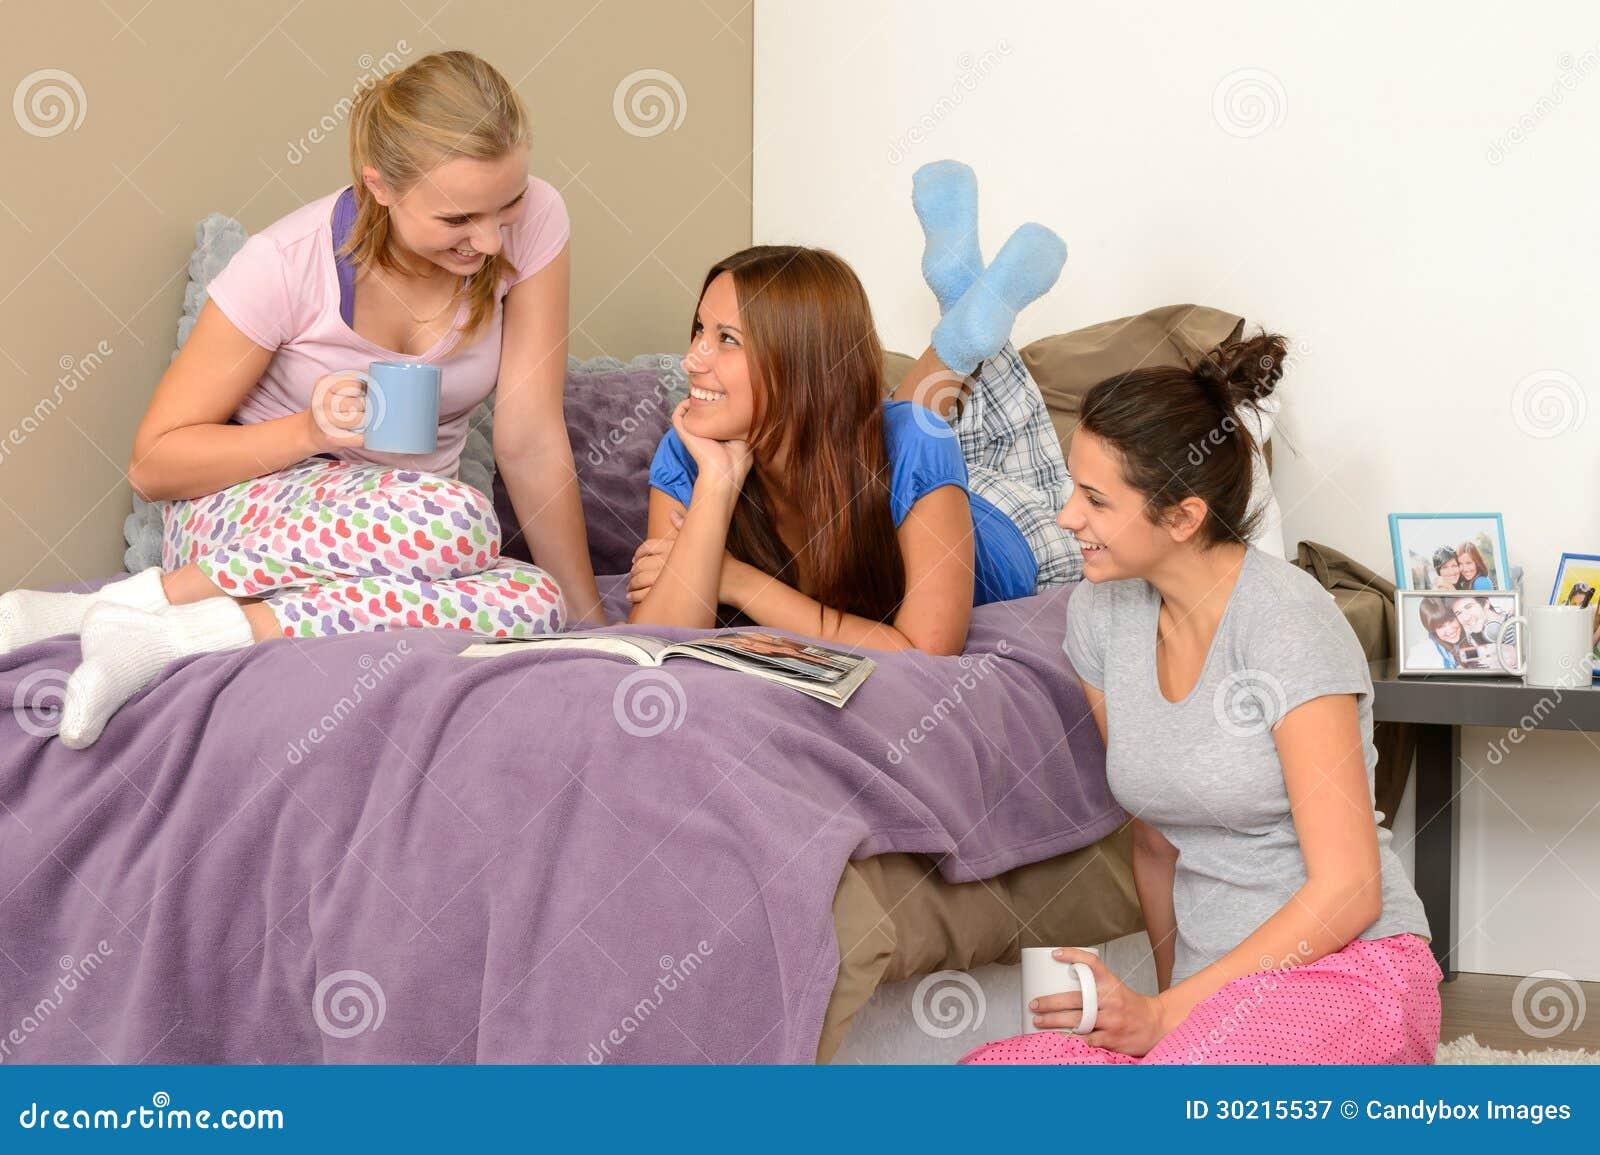 Her teenage girl pajamas offer ass